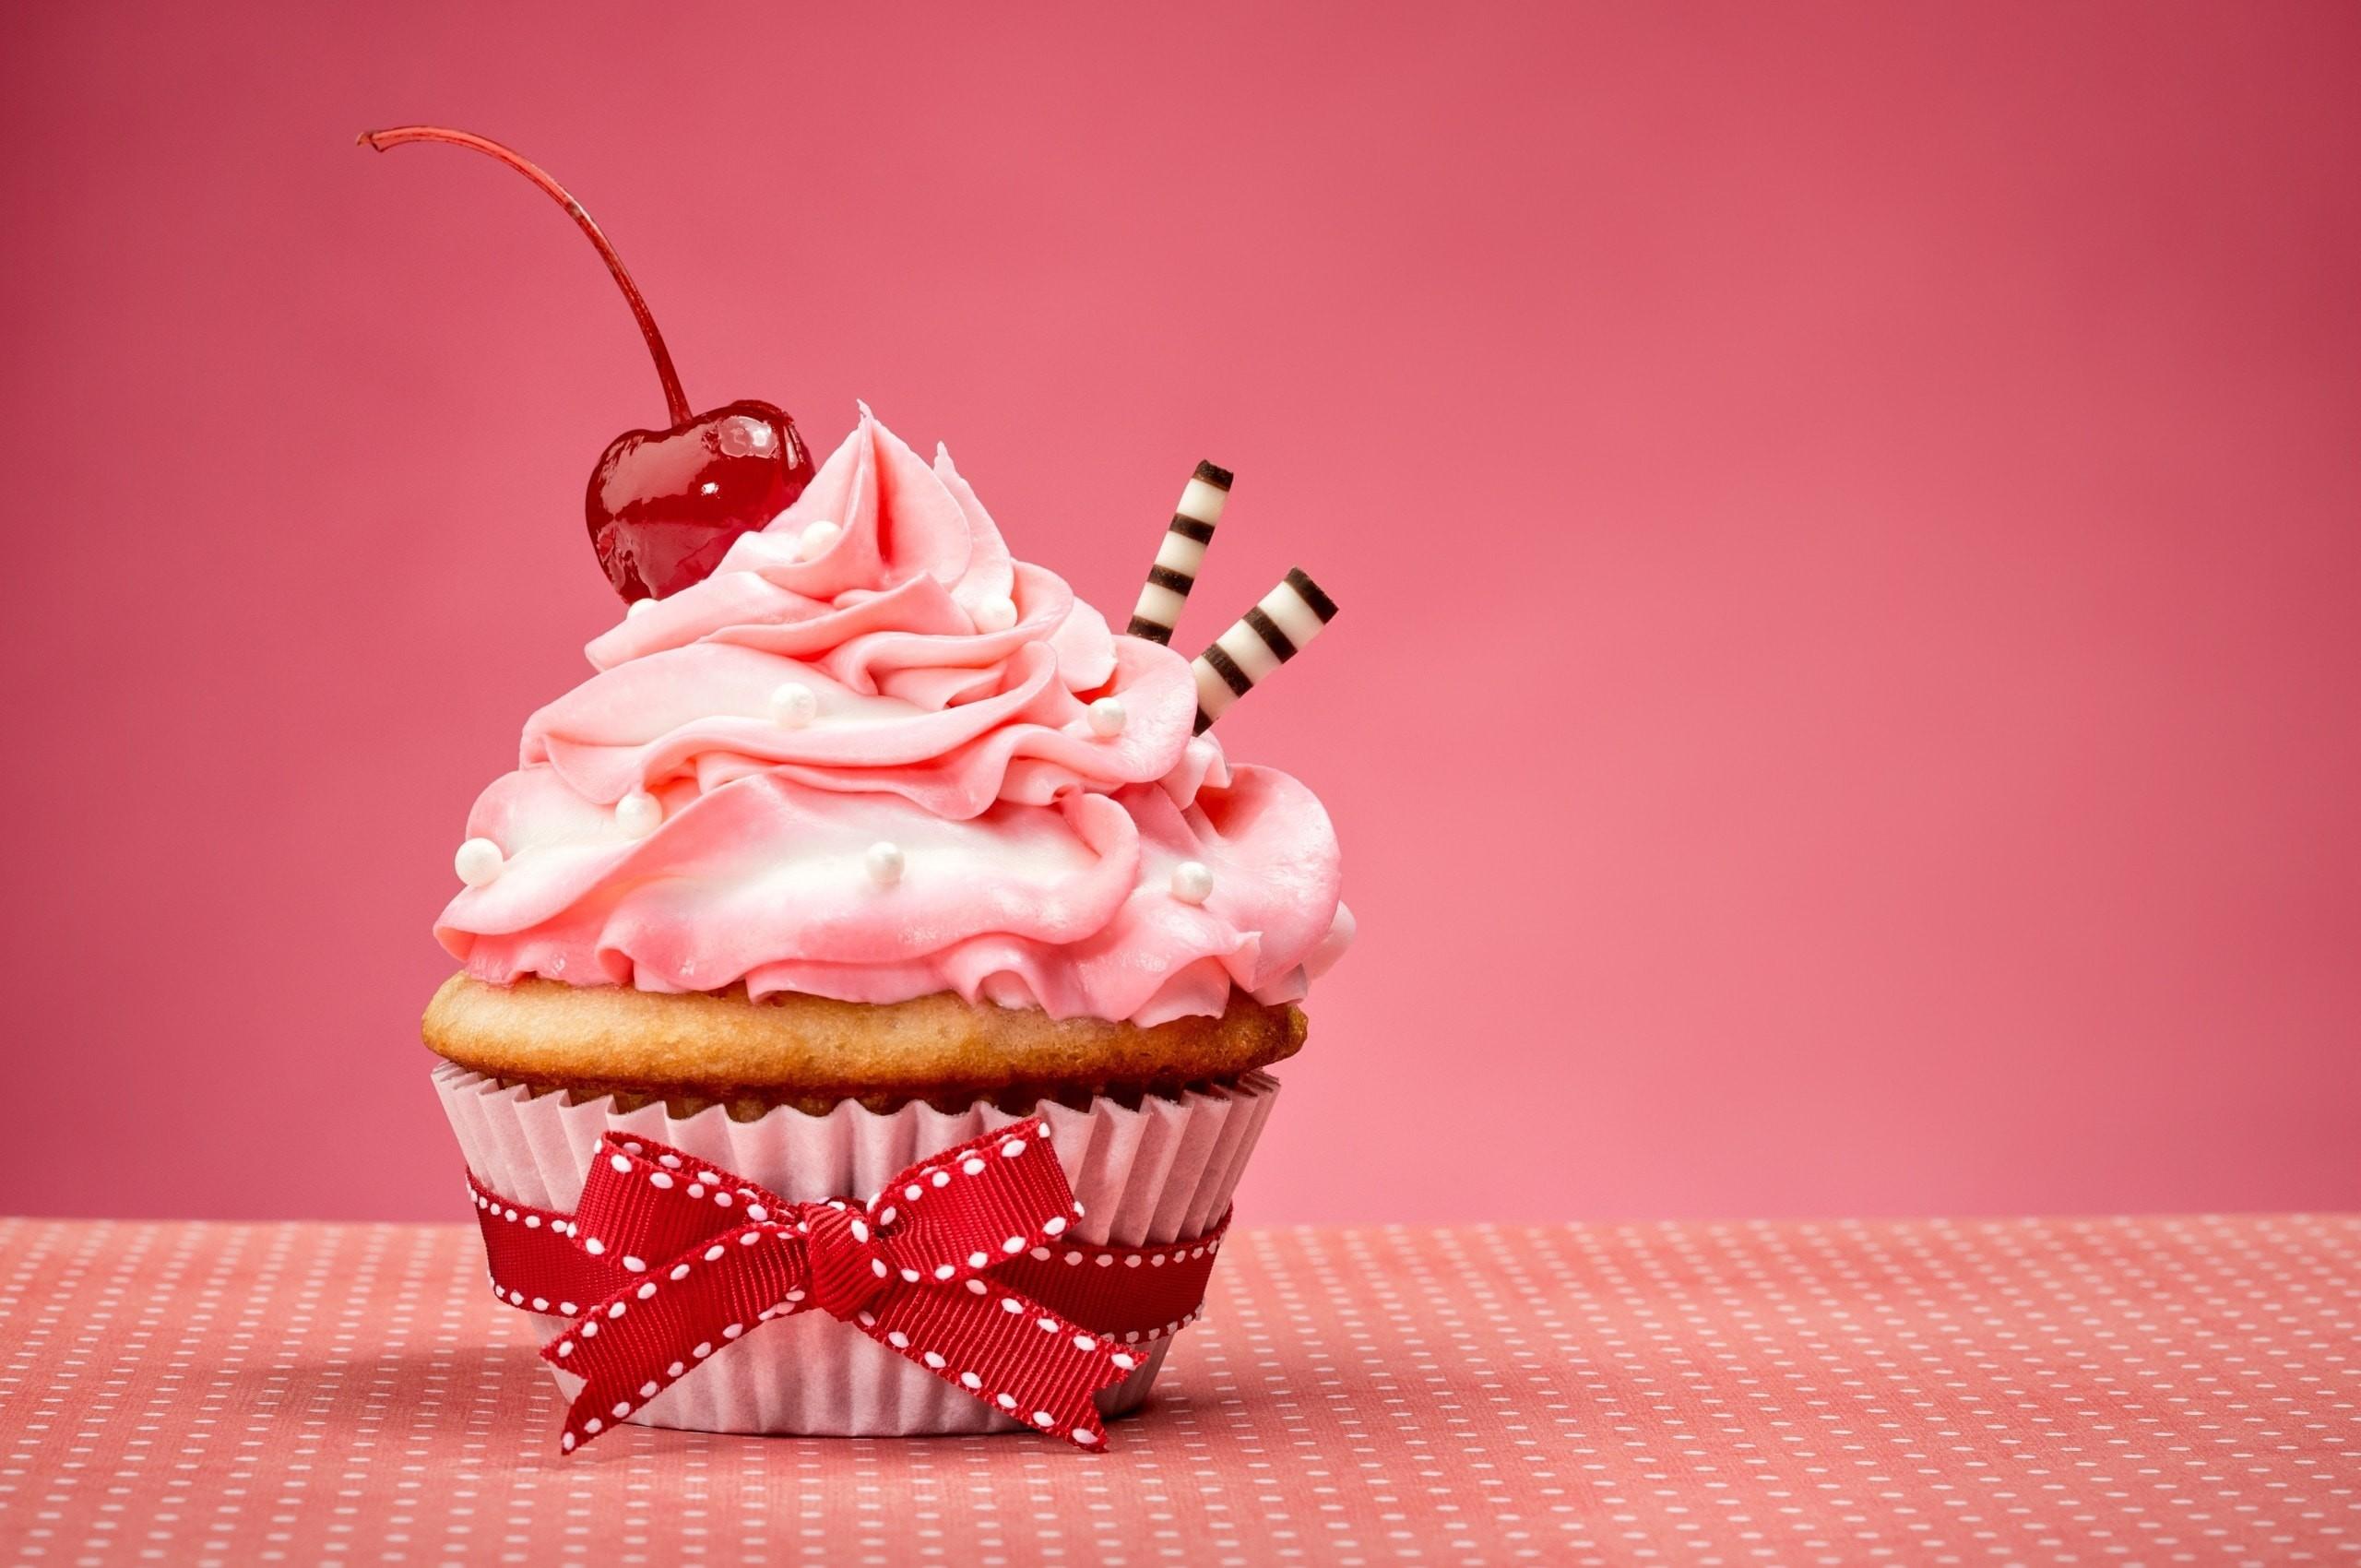 2560x1600 0 HD Wallpaper Cakes Happy Birthday Cake Download 4K Resolution